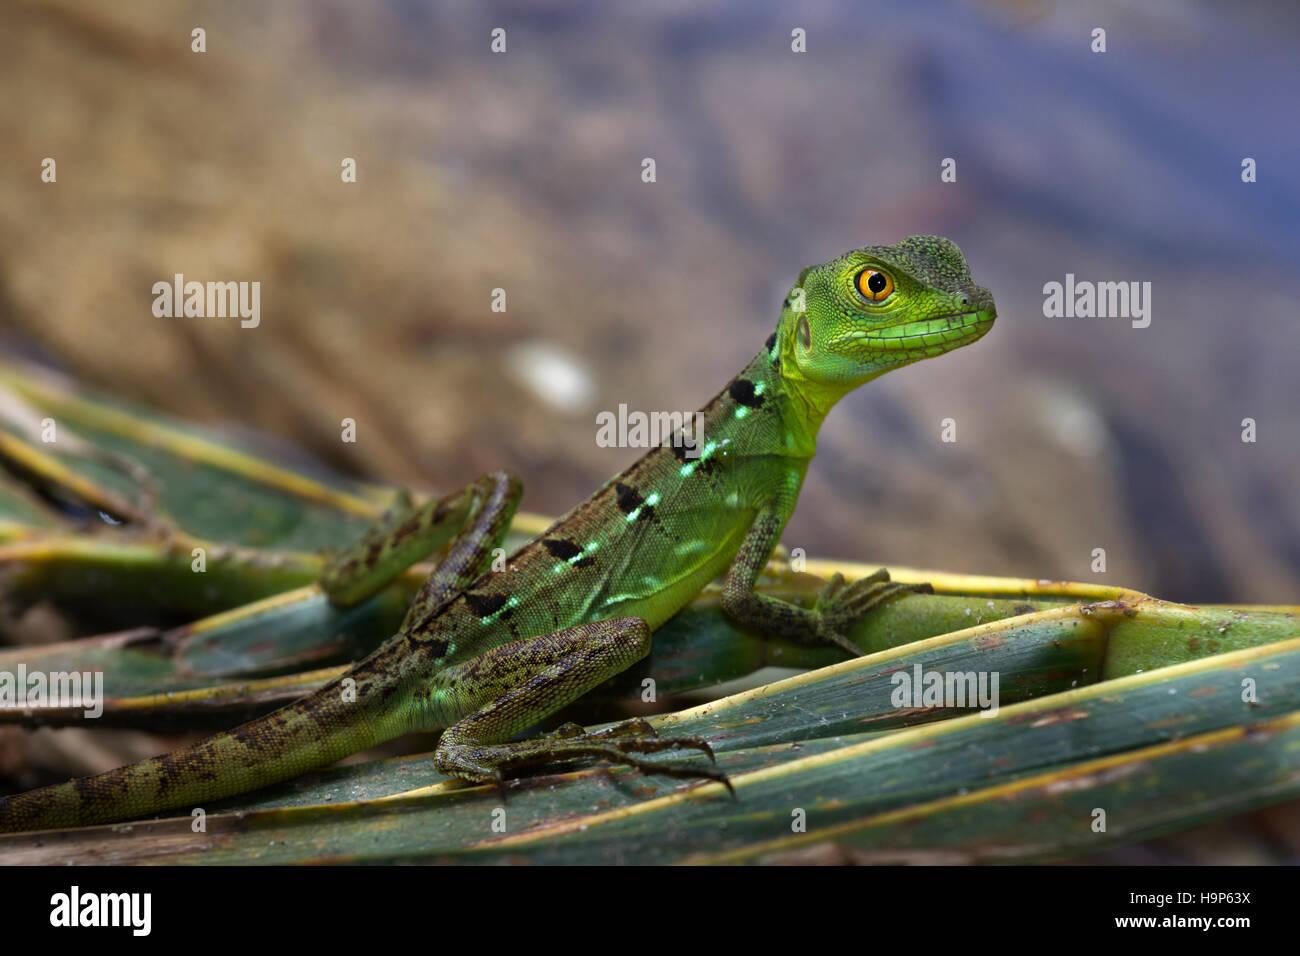 Plumed or green basilisk, Basiliscus plumifrons - Stock Image